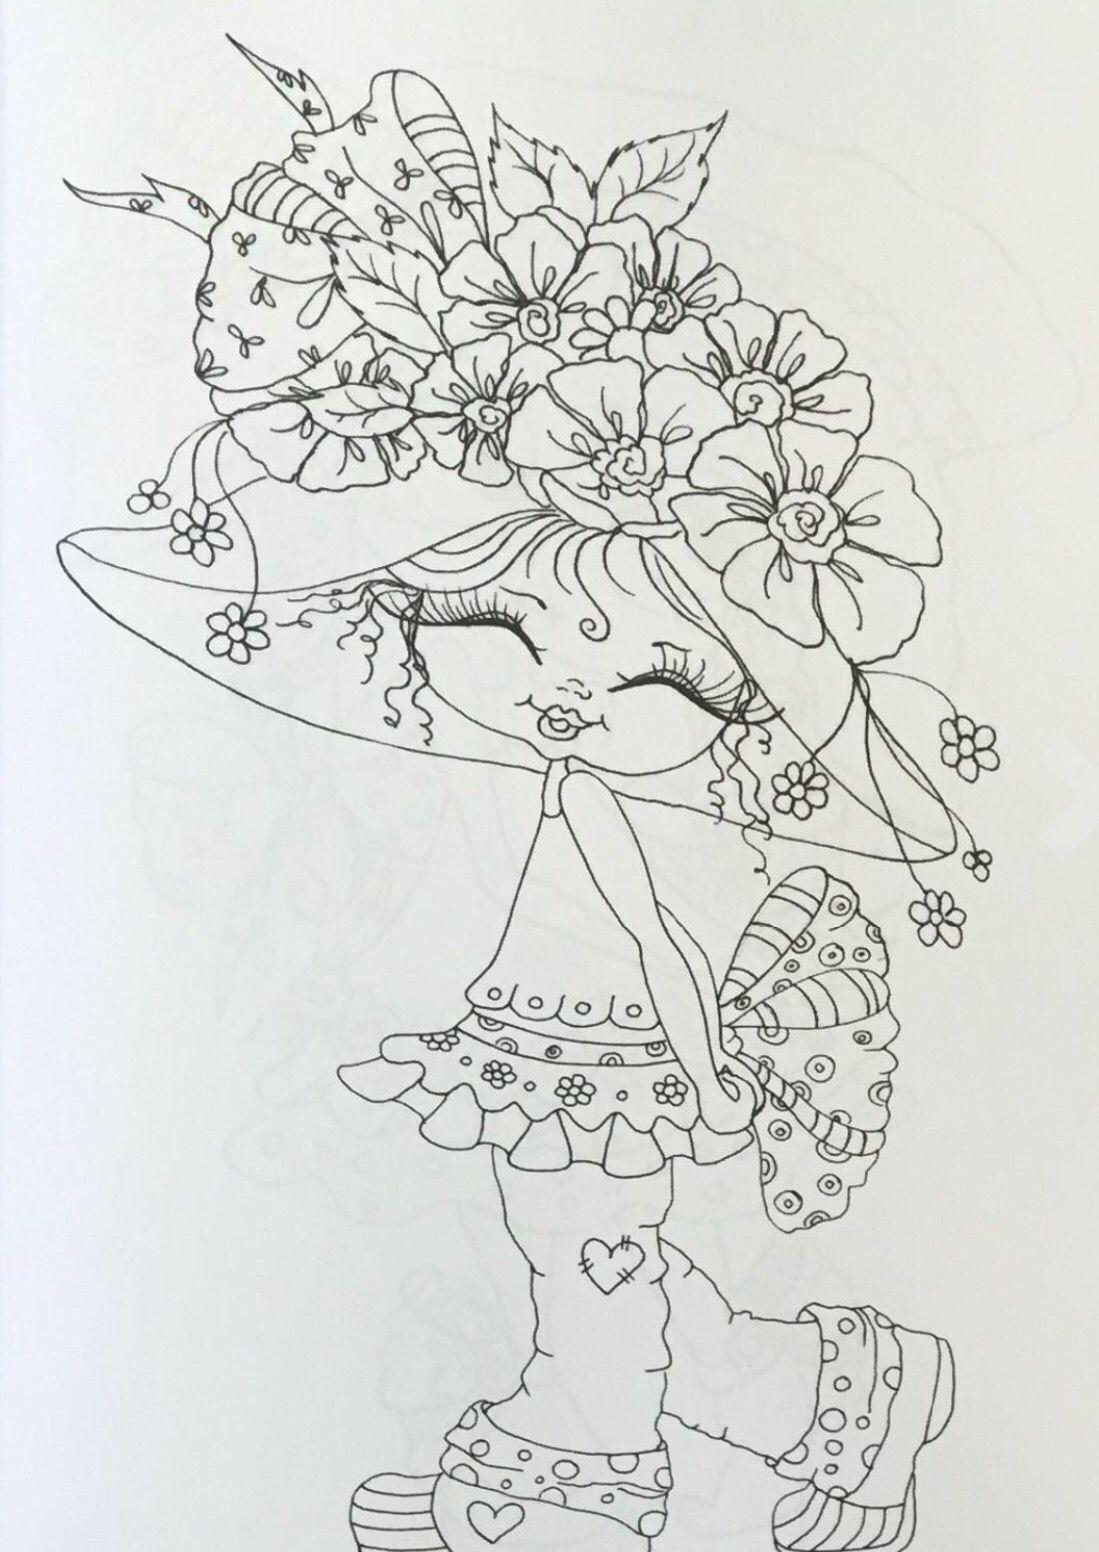 Pin de Rosalba Jaramillo en DIBUJOS | Pinterest | Dibujo, Colorear y ...